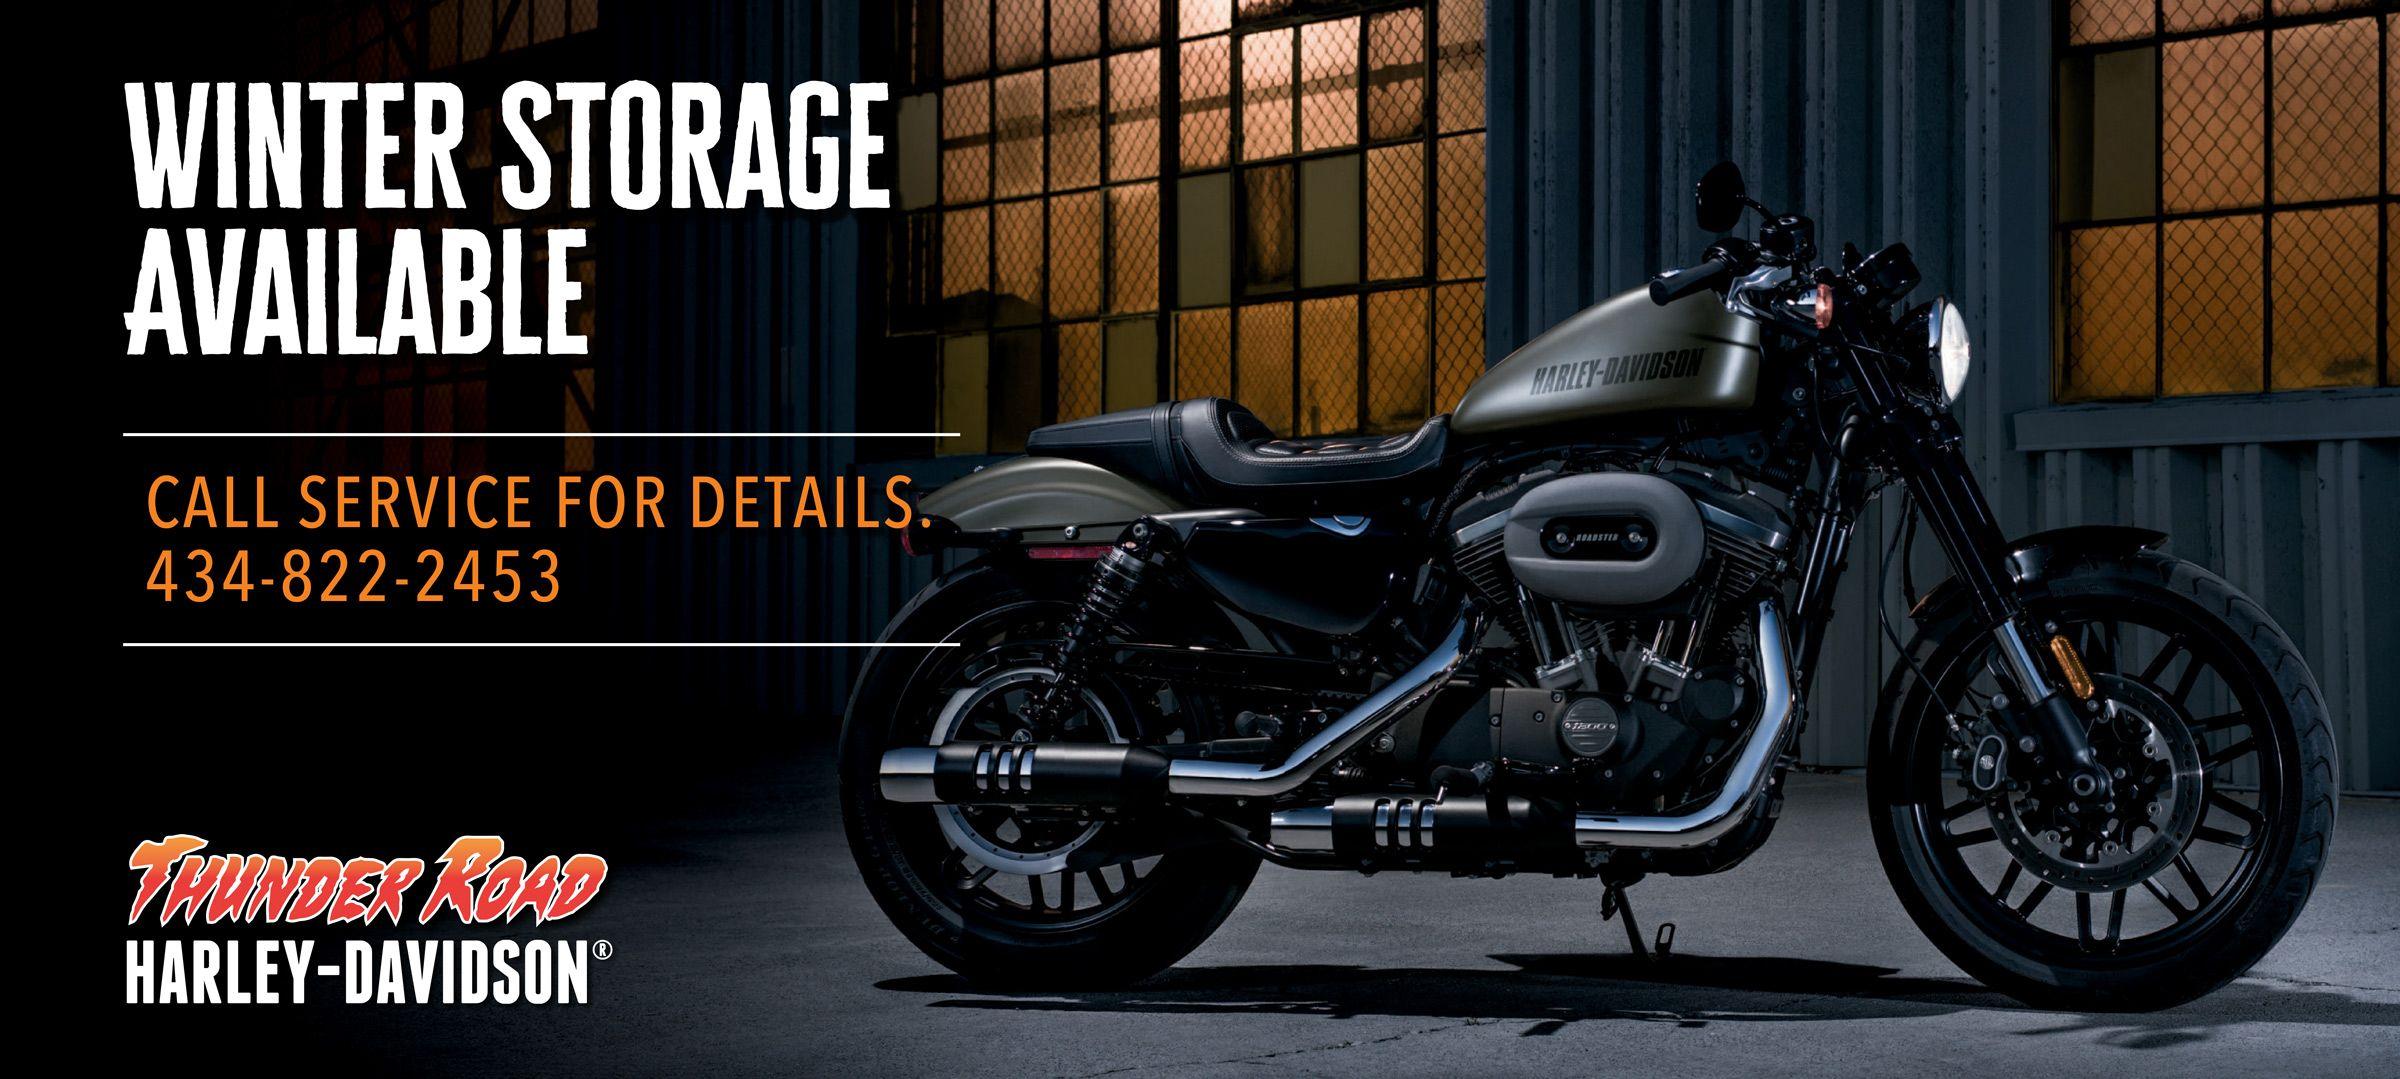 New Used Motorcycle Dealer Thunder Road Harley Davidson